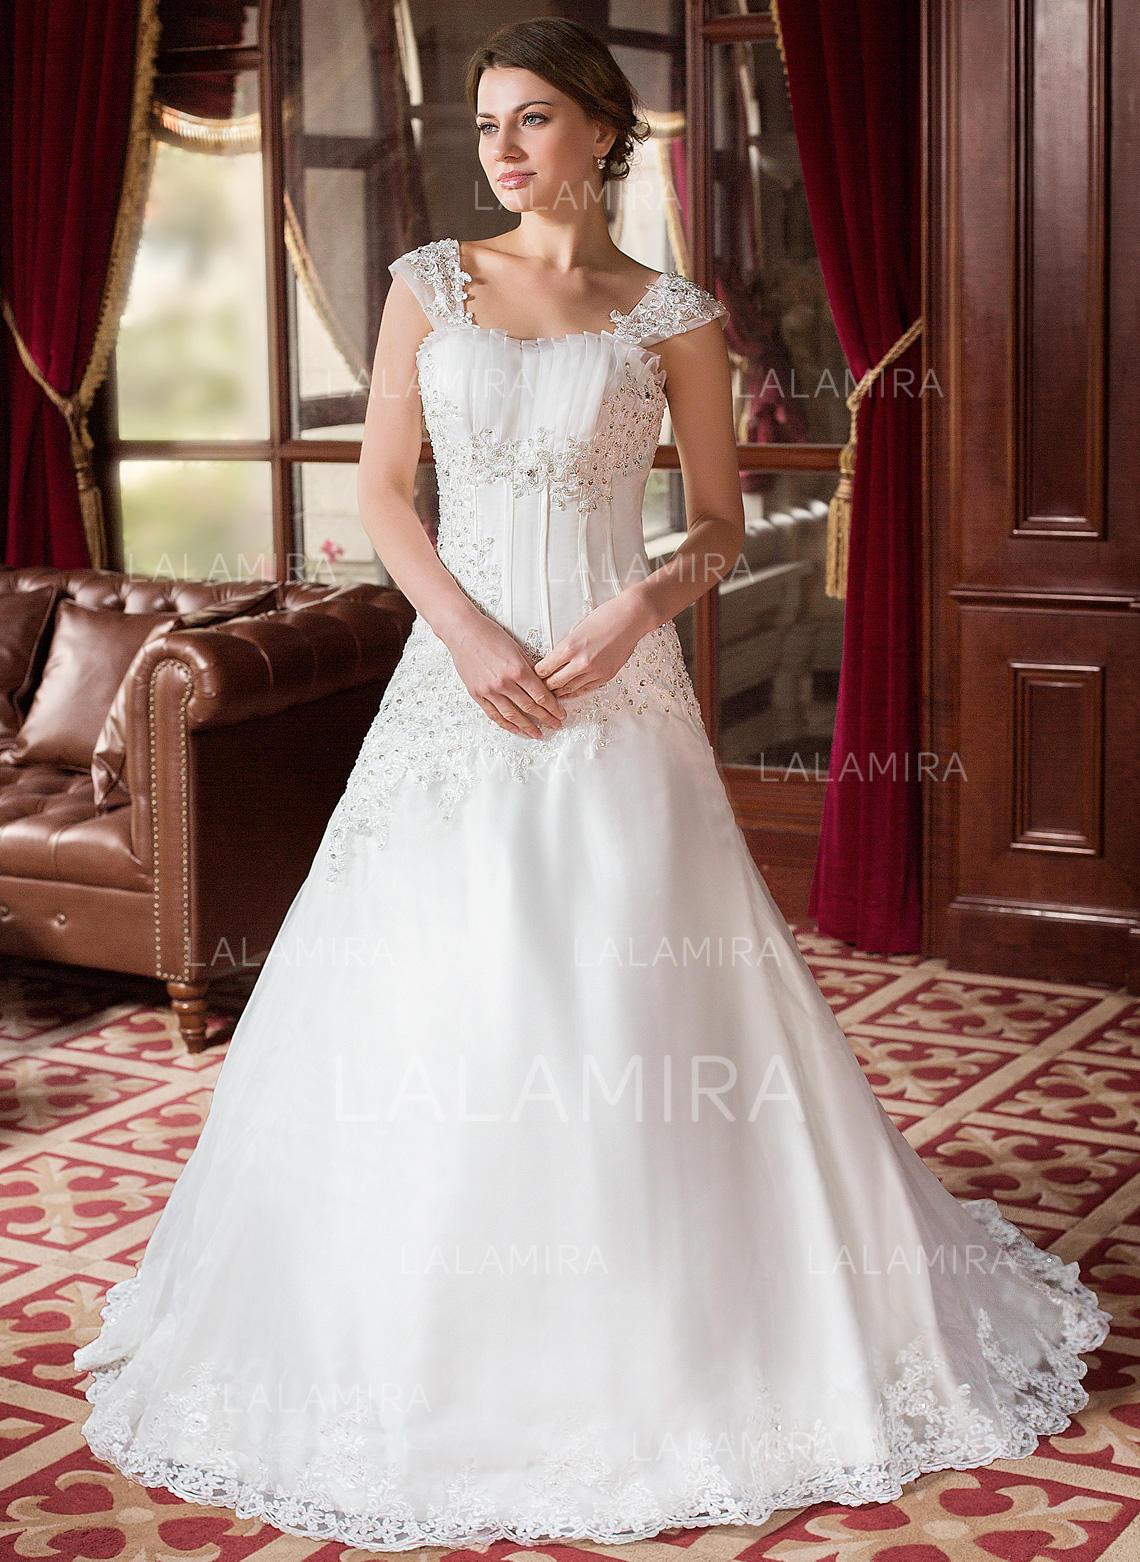 c8e2fa317b6 A-Line Princess Ruffle Beading Appliques Satin Organza Court Train  Three-dimensional Wedding. Loading zoom